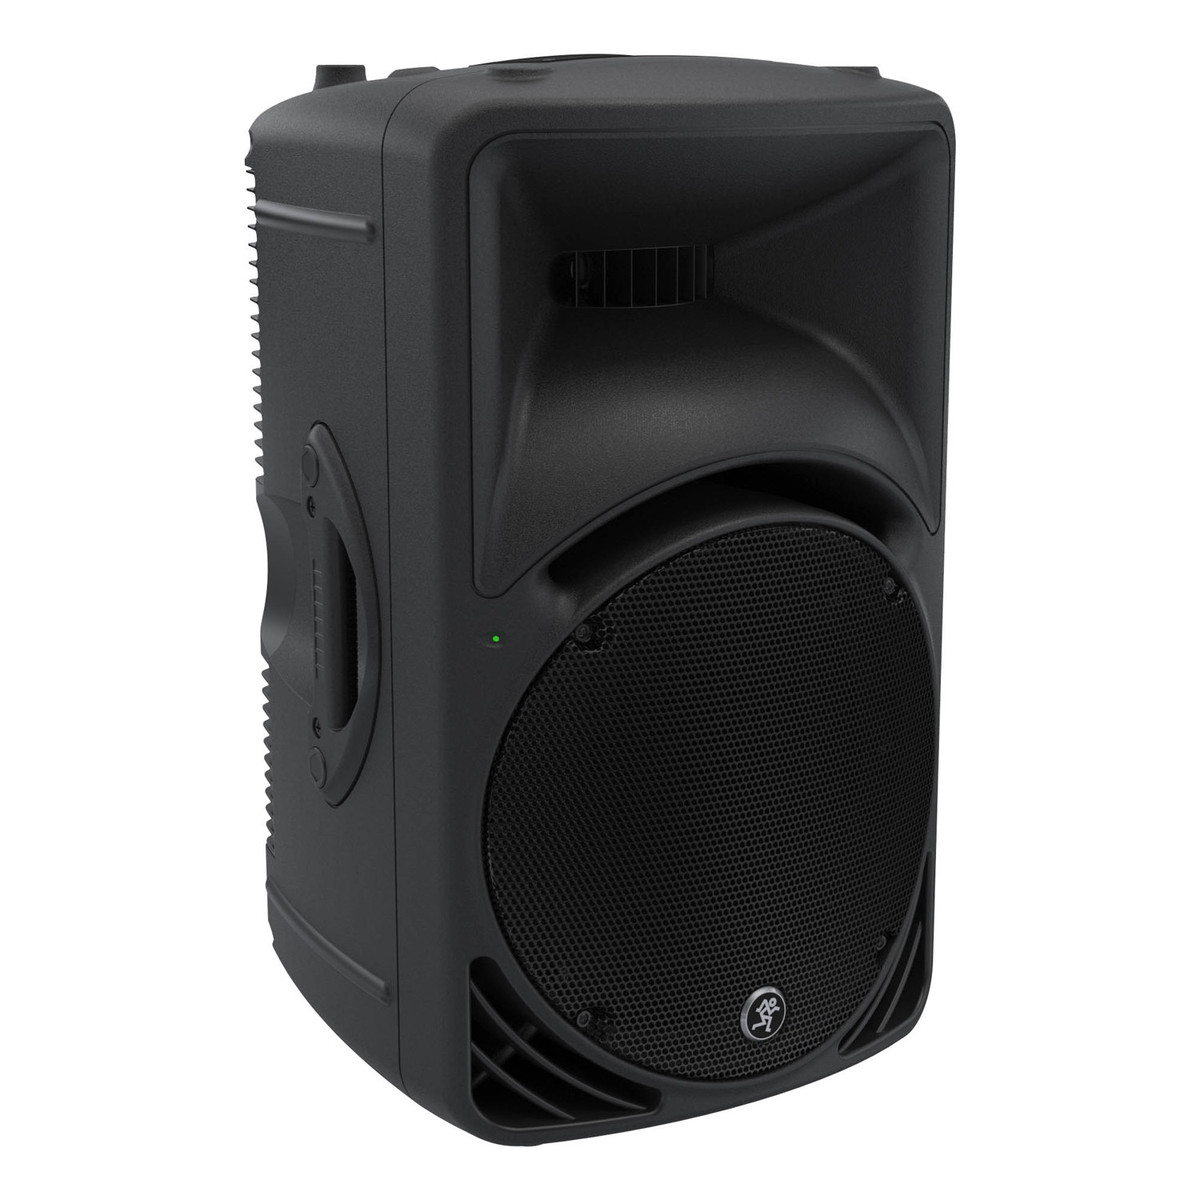 mackie srm450 v3 active pa speaker pair with free stands at. Black Bedroom Furniture Sets. Home Design Ideas